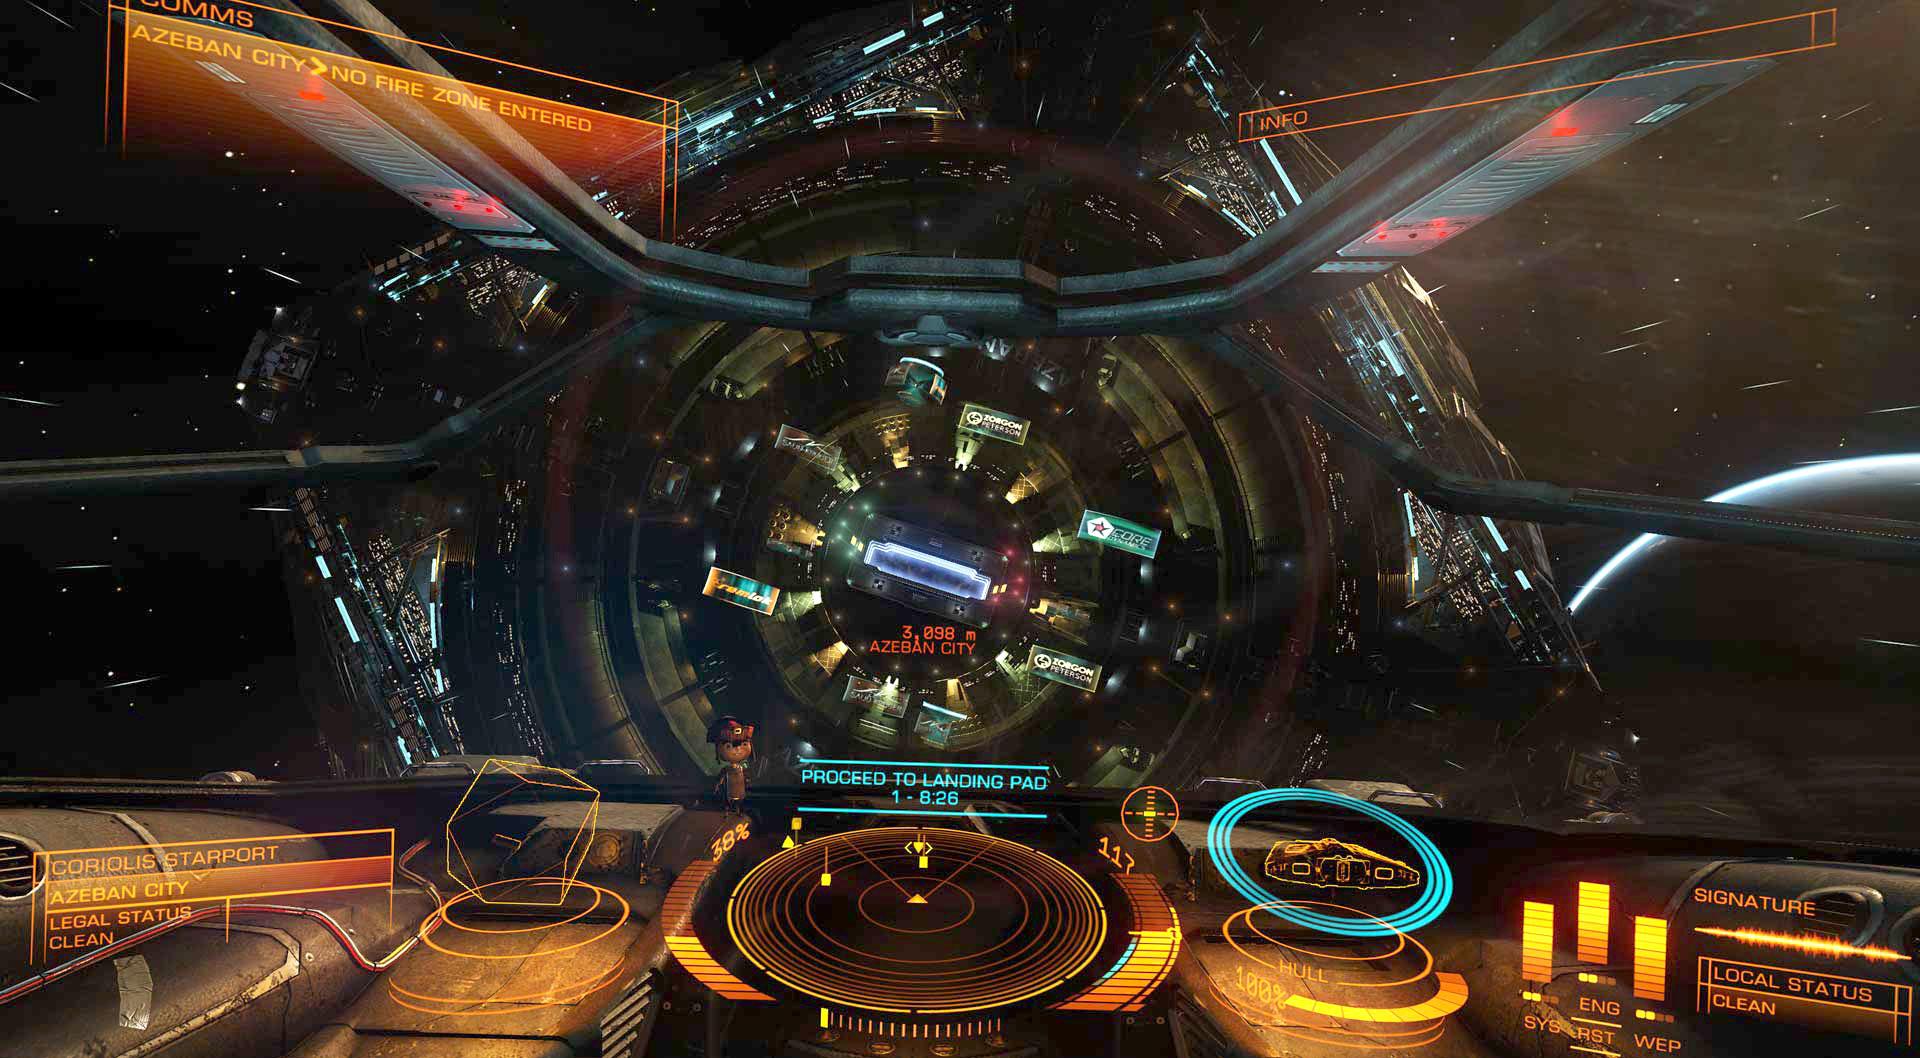 La beta 2 de Elite: Dangerous arranca el 30 de septiembre